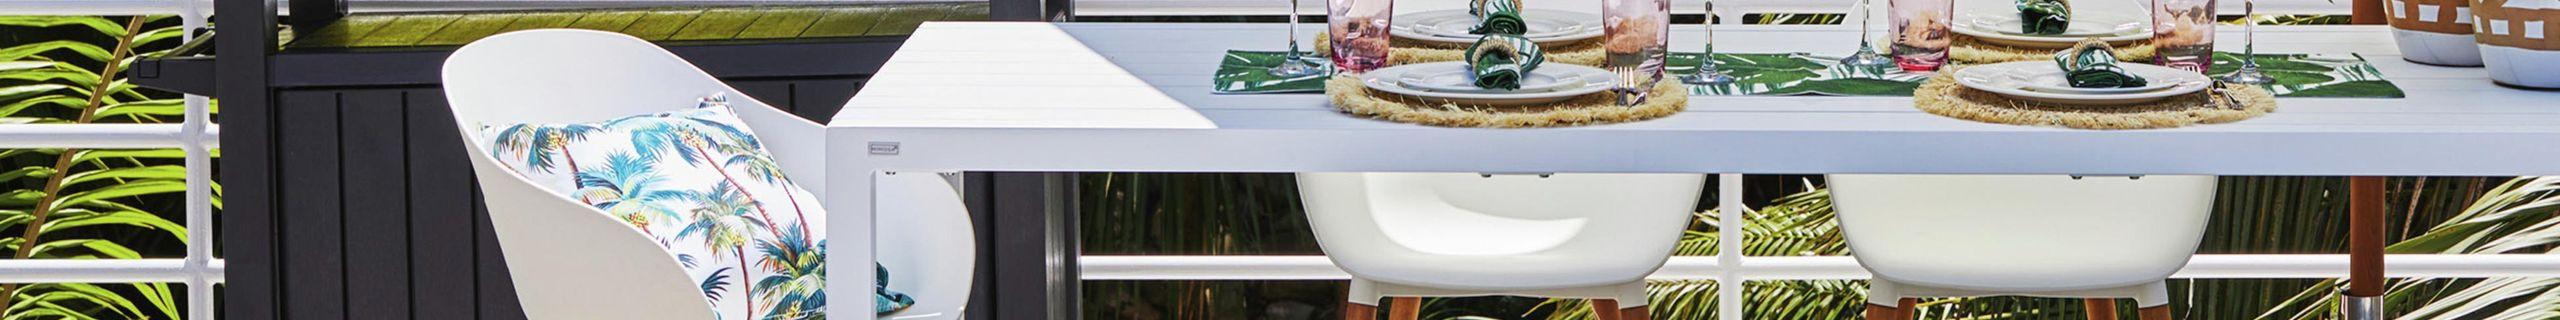 Outdoor Furniture - Outdoor Entertaining - Medium